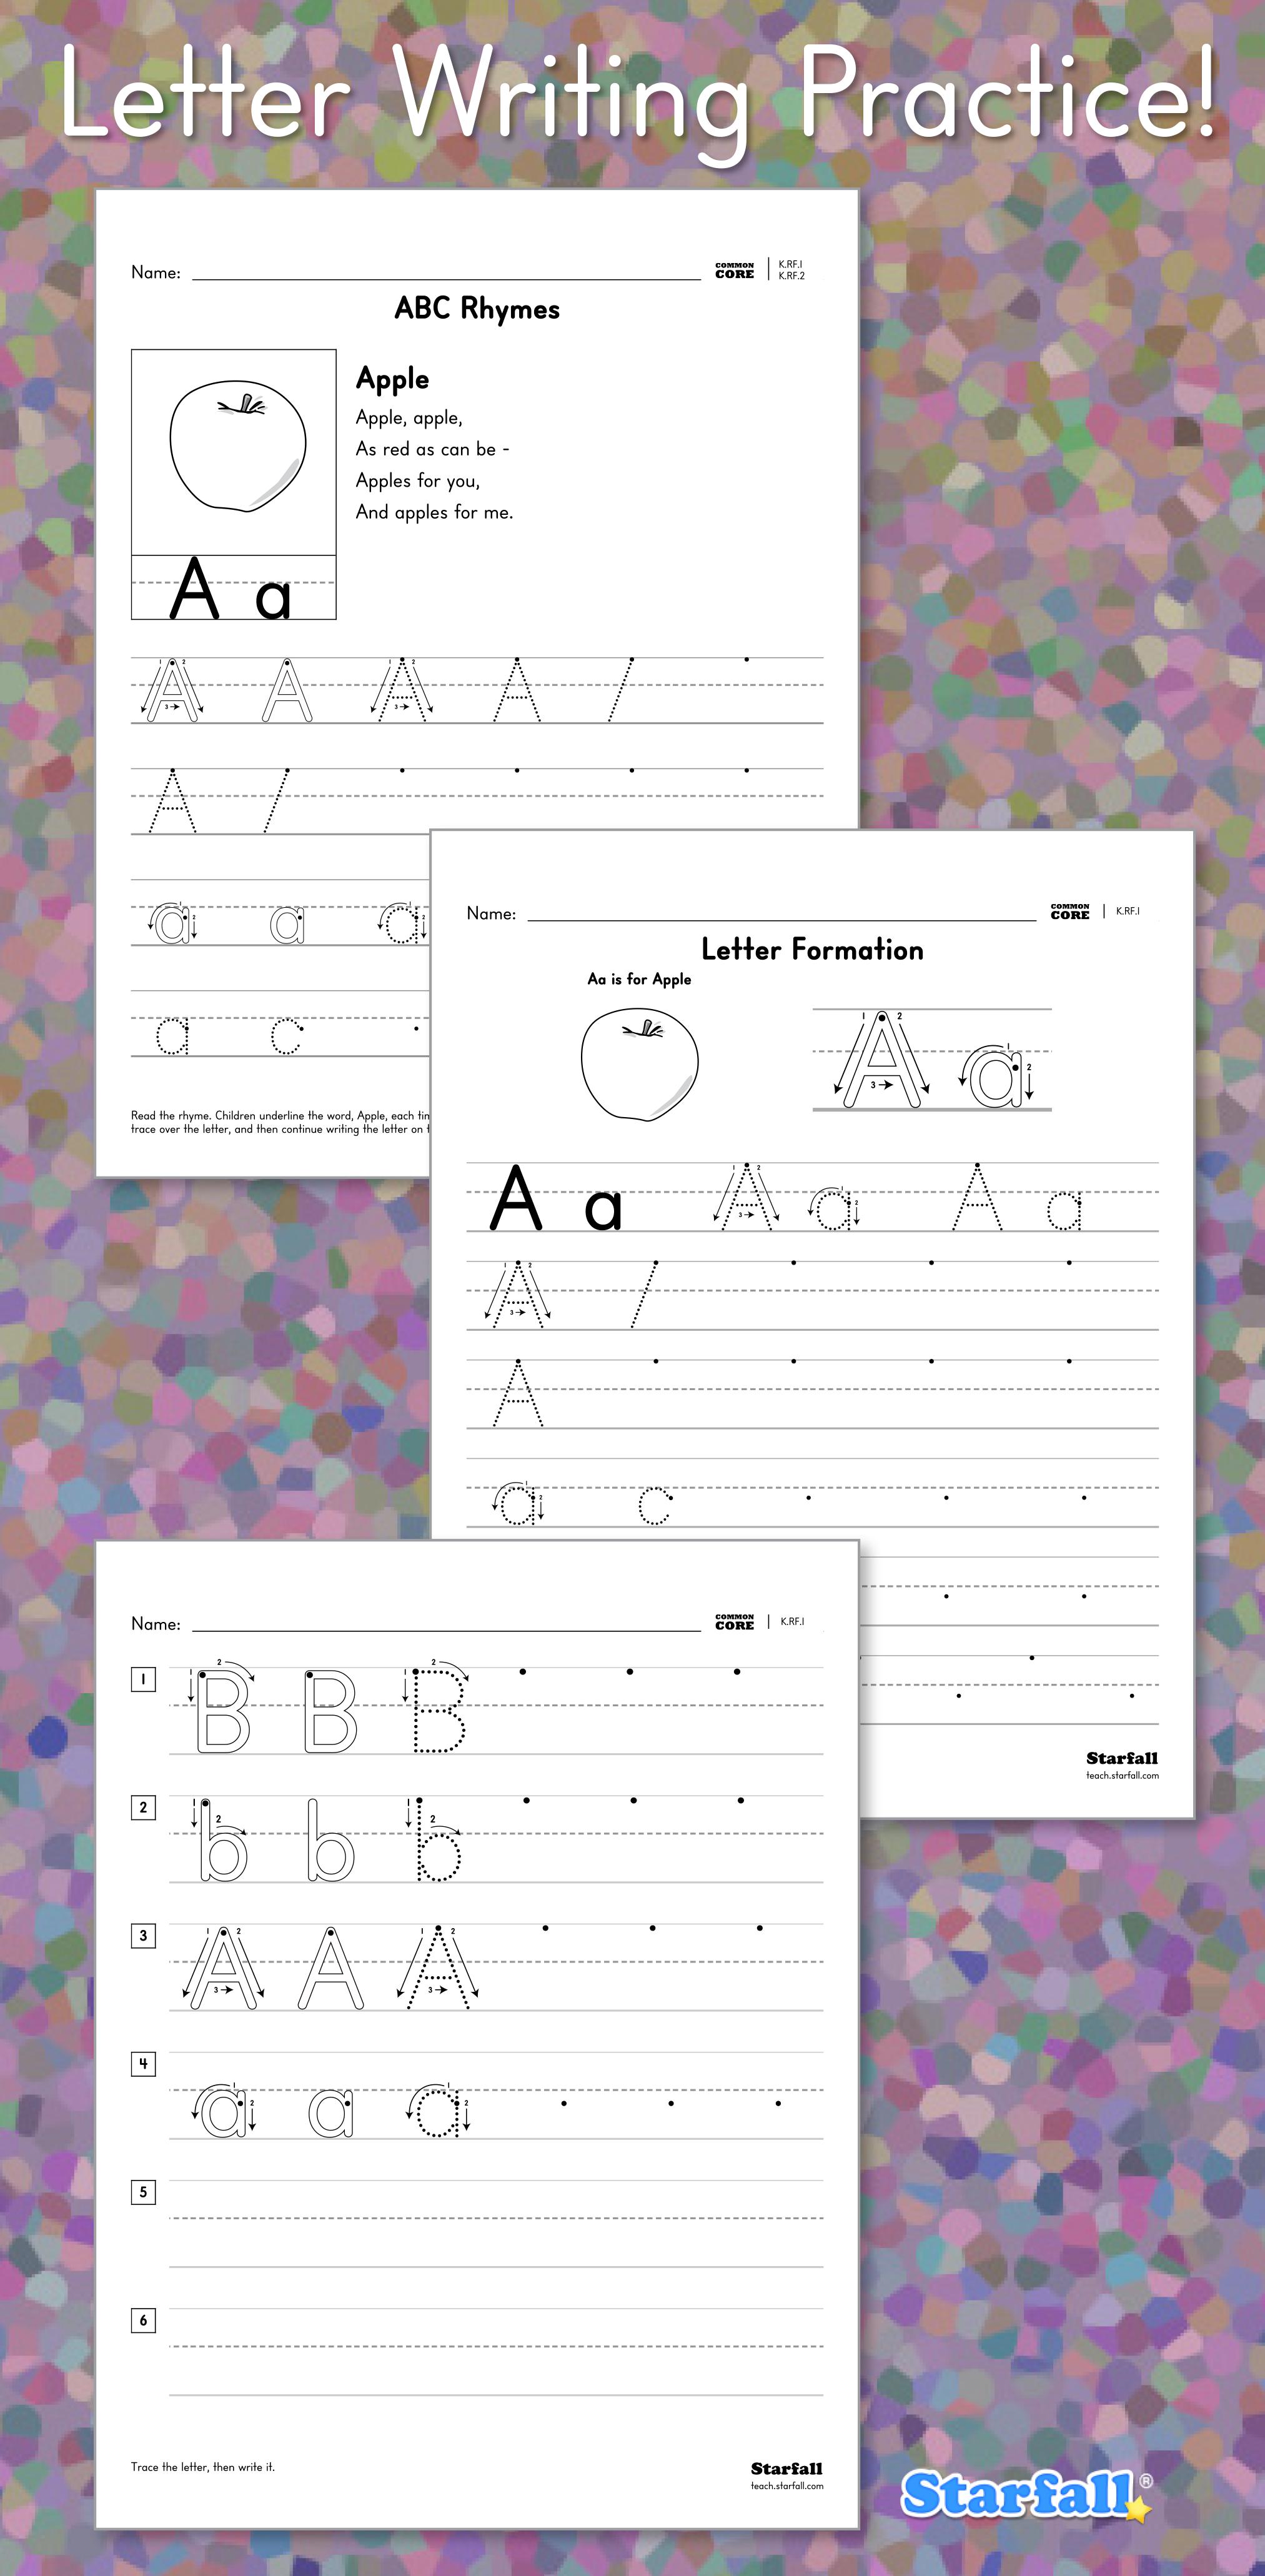 Free Customizable Worksheets From Starfall So Children